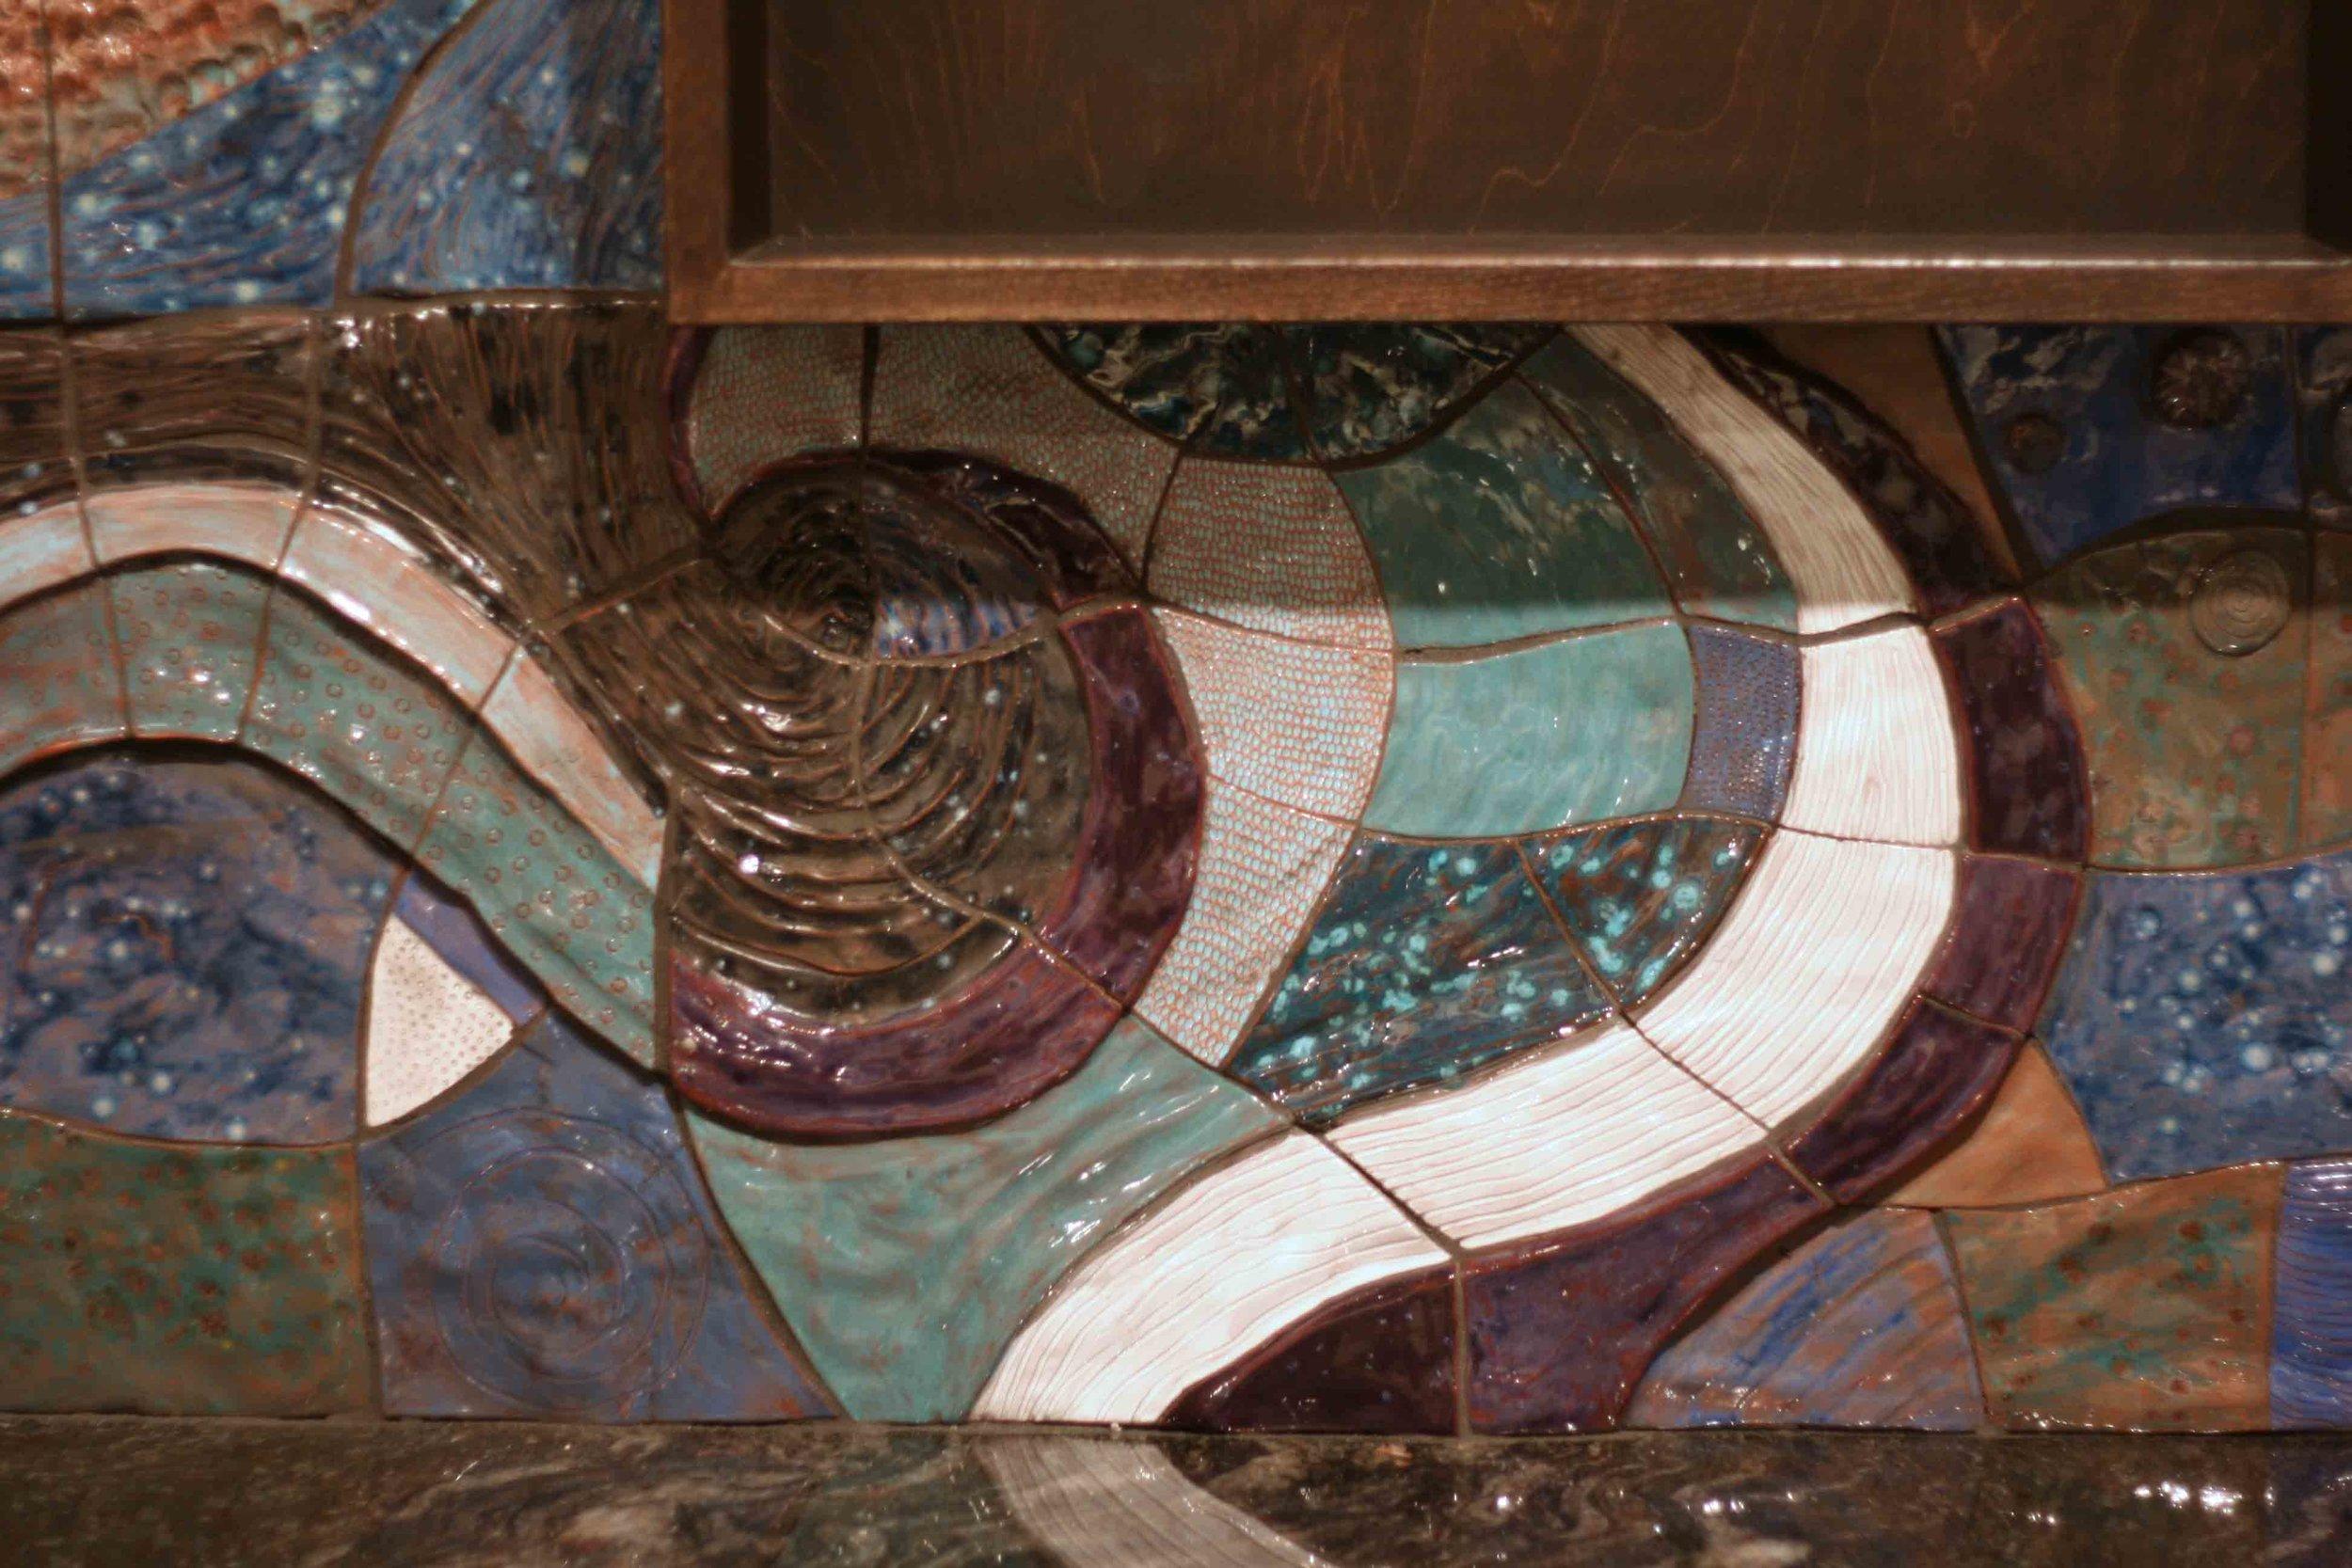 olas-tiles-closeup.jpg